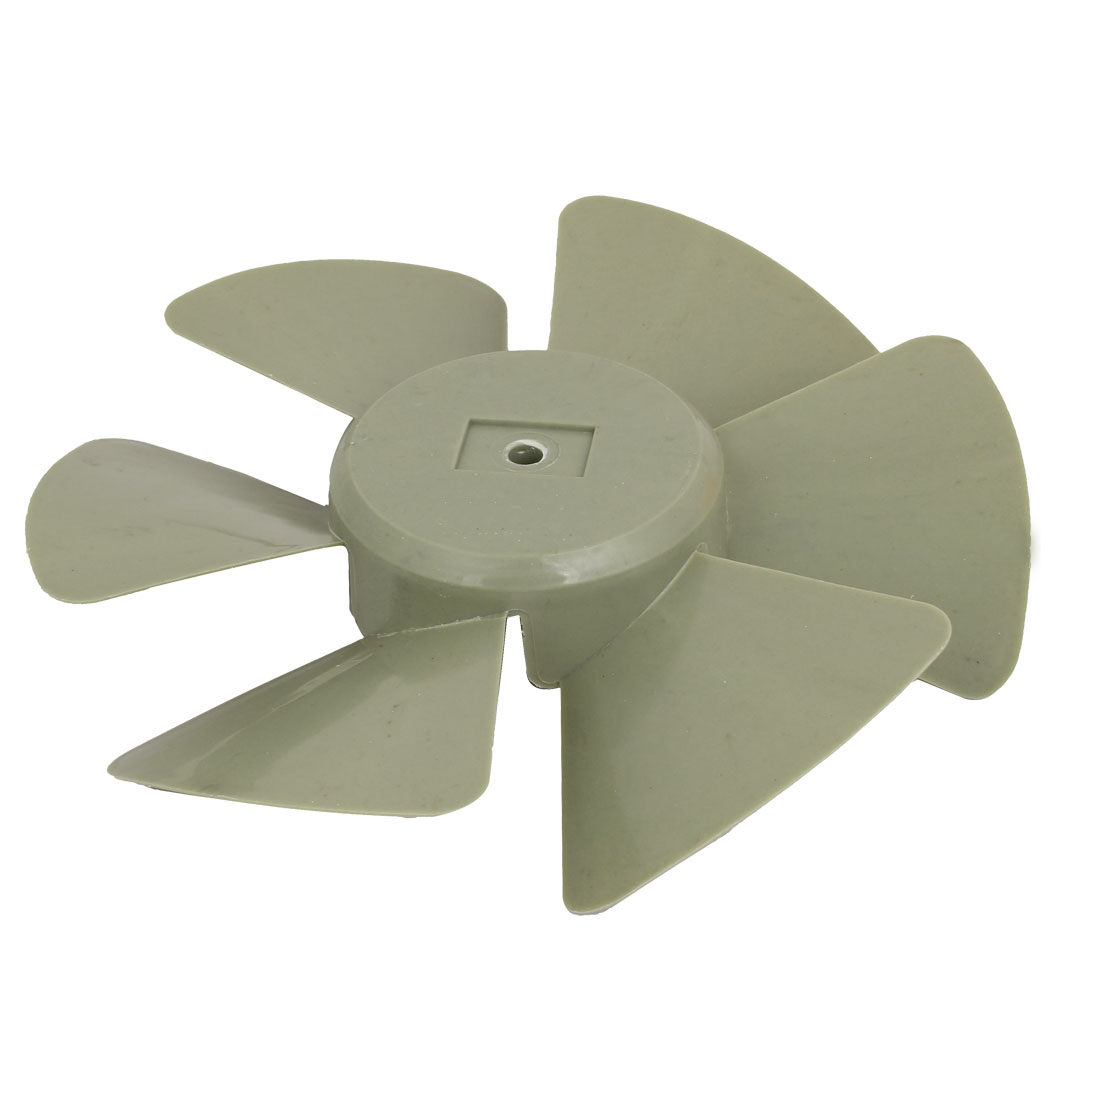 kitchen fan cabinet lighting ideas unique bargains 230mm dia 8mm shaft 6 vanes plastic home ventilator vane gray